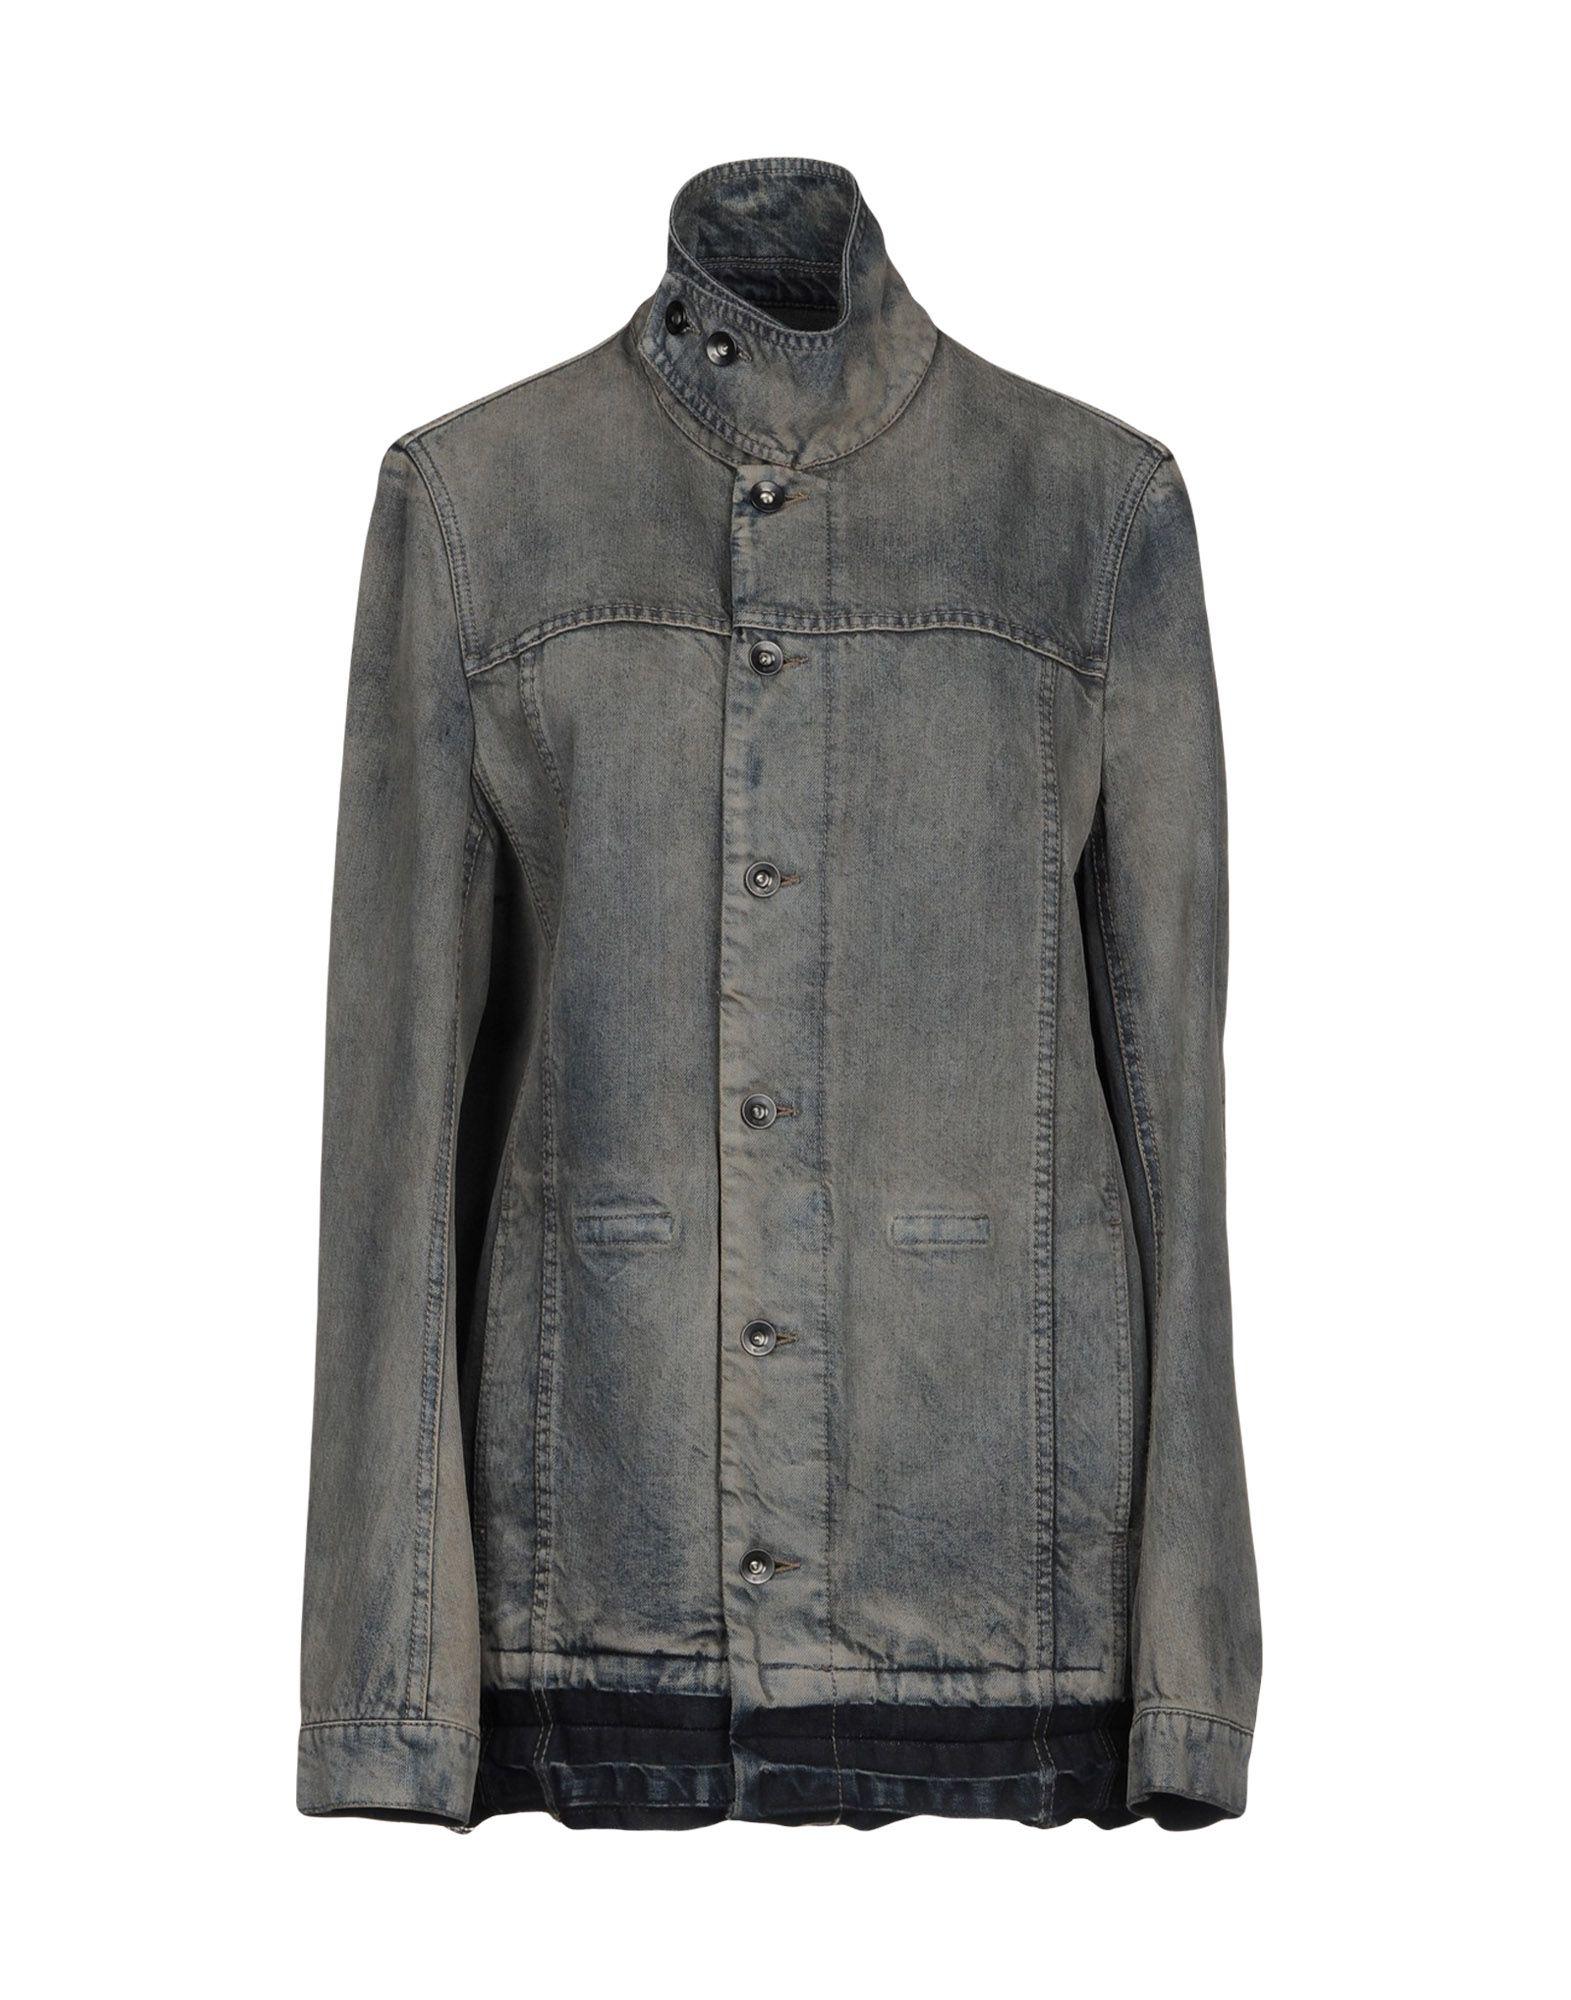 DRKSHDW by RICK OWENS Джинсовая верхняя одежда пуловер quelle rick cardona by heine 6170